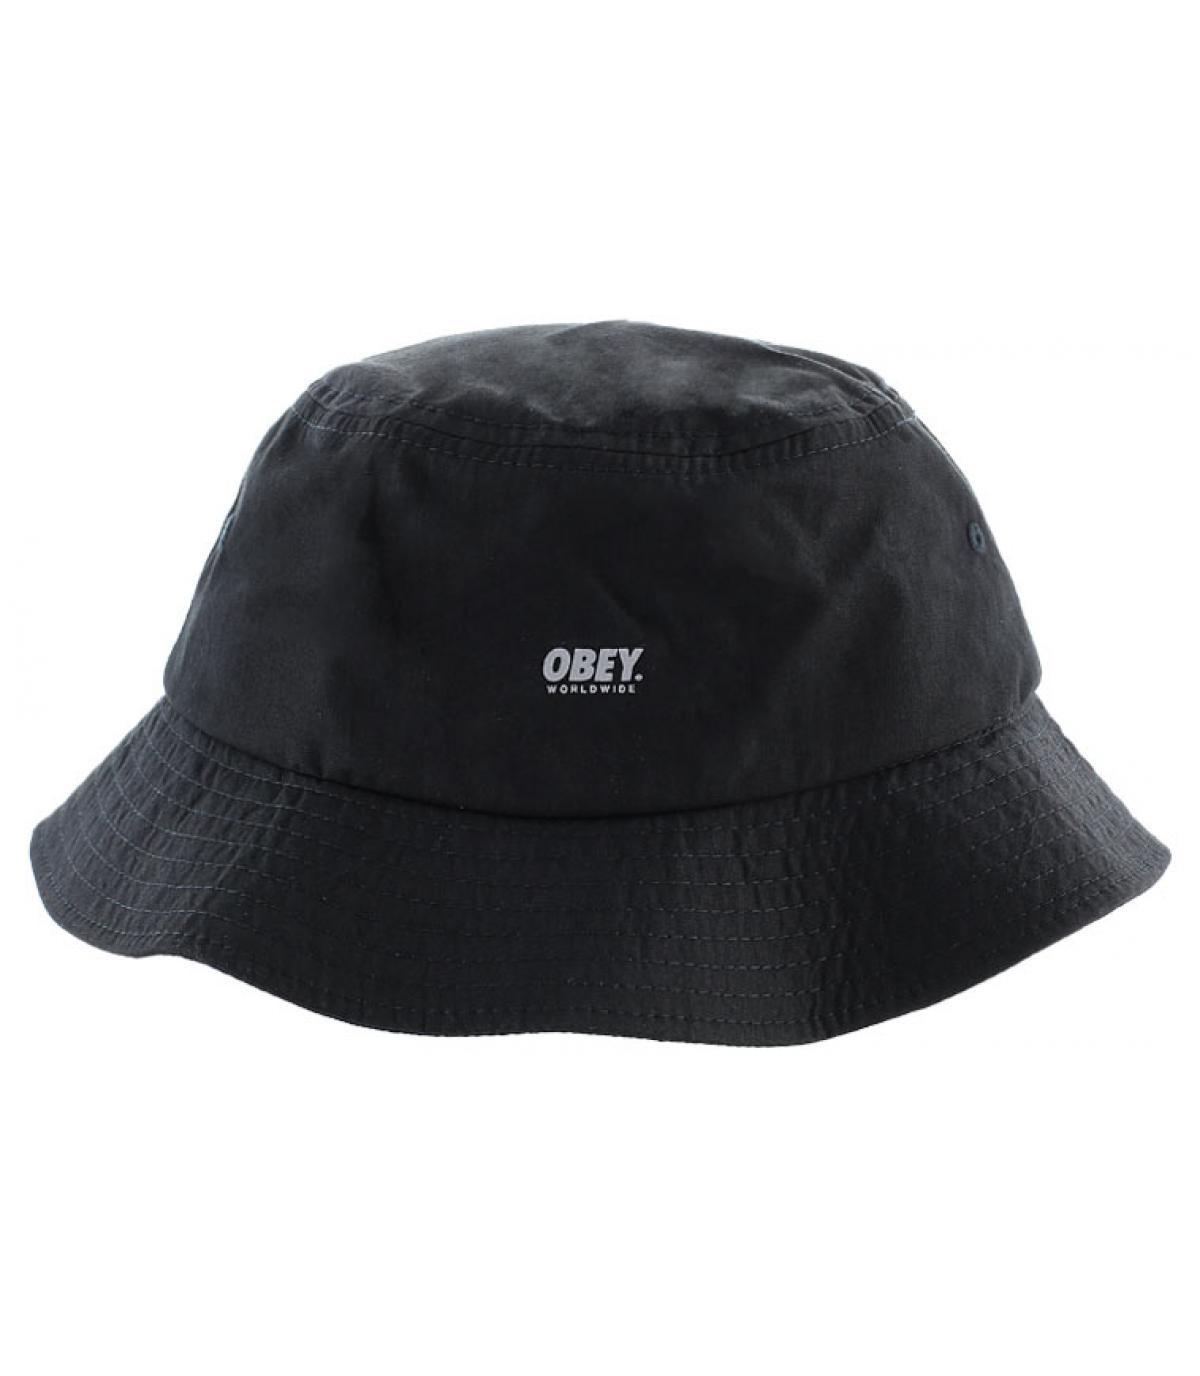 Bob Obey negro